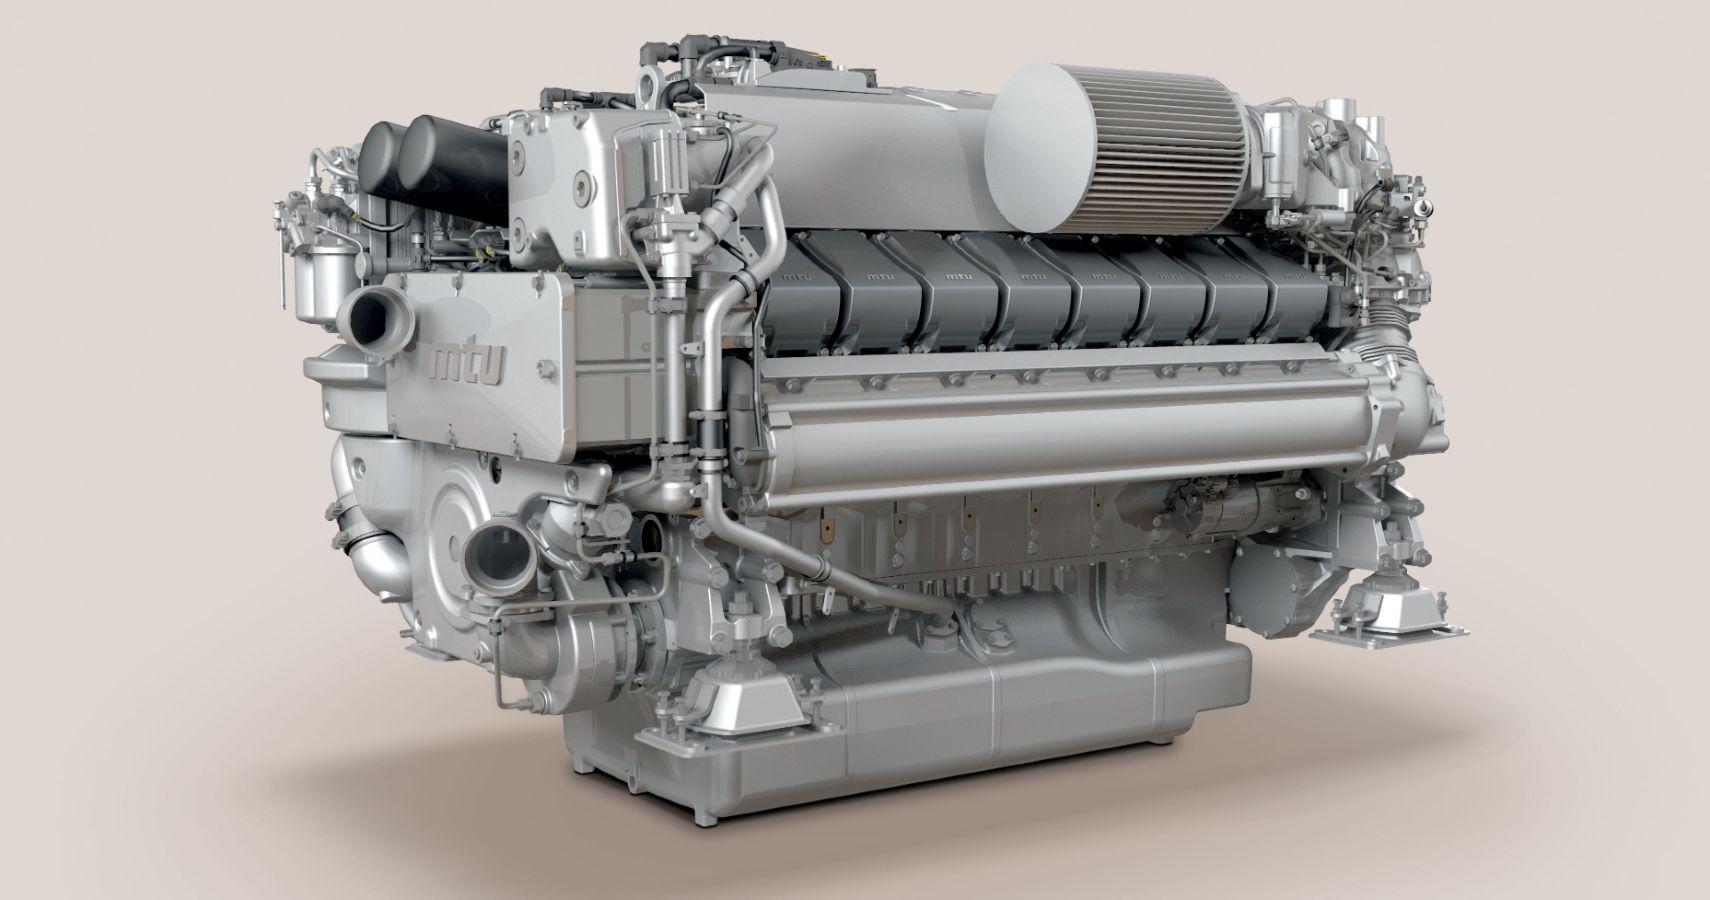 Rolls-Royce Upgrades Its MTU Yacht Engine, Giving It 2,000 Horsepower